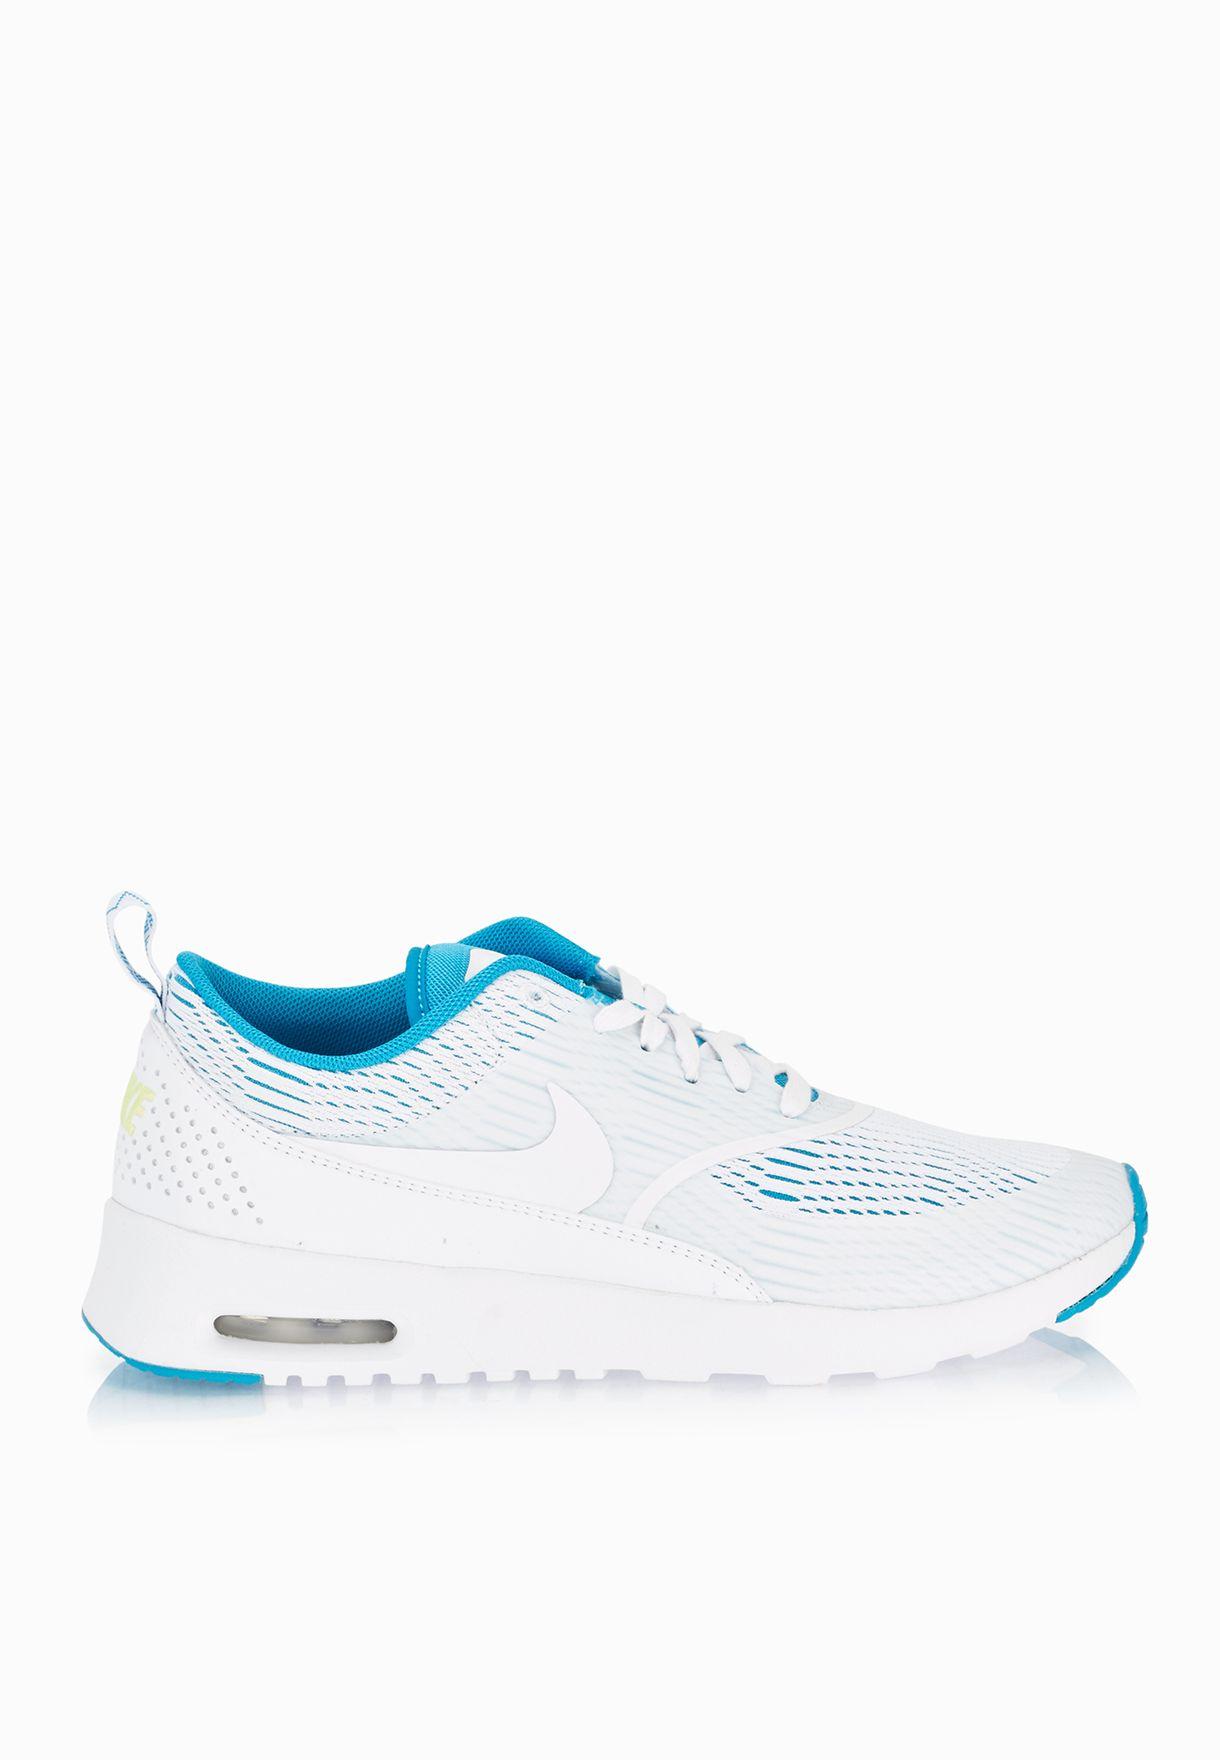 quality design 36c97 2b6c8 Shop Nike white Air Max Thea EM 833887-100 for Women in UAE ...